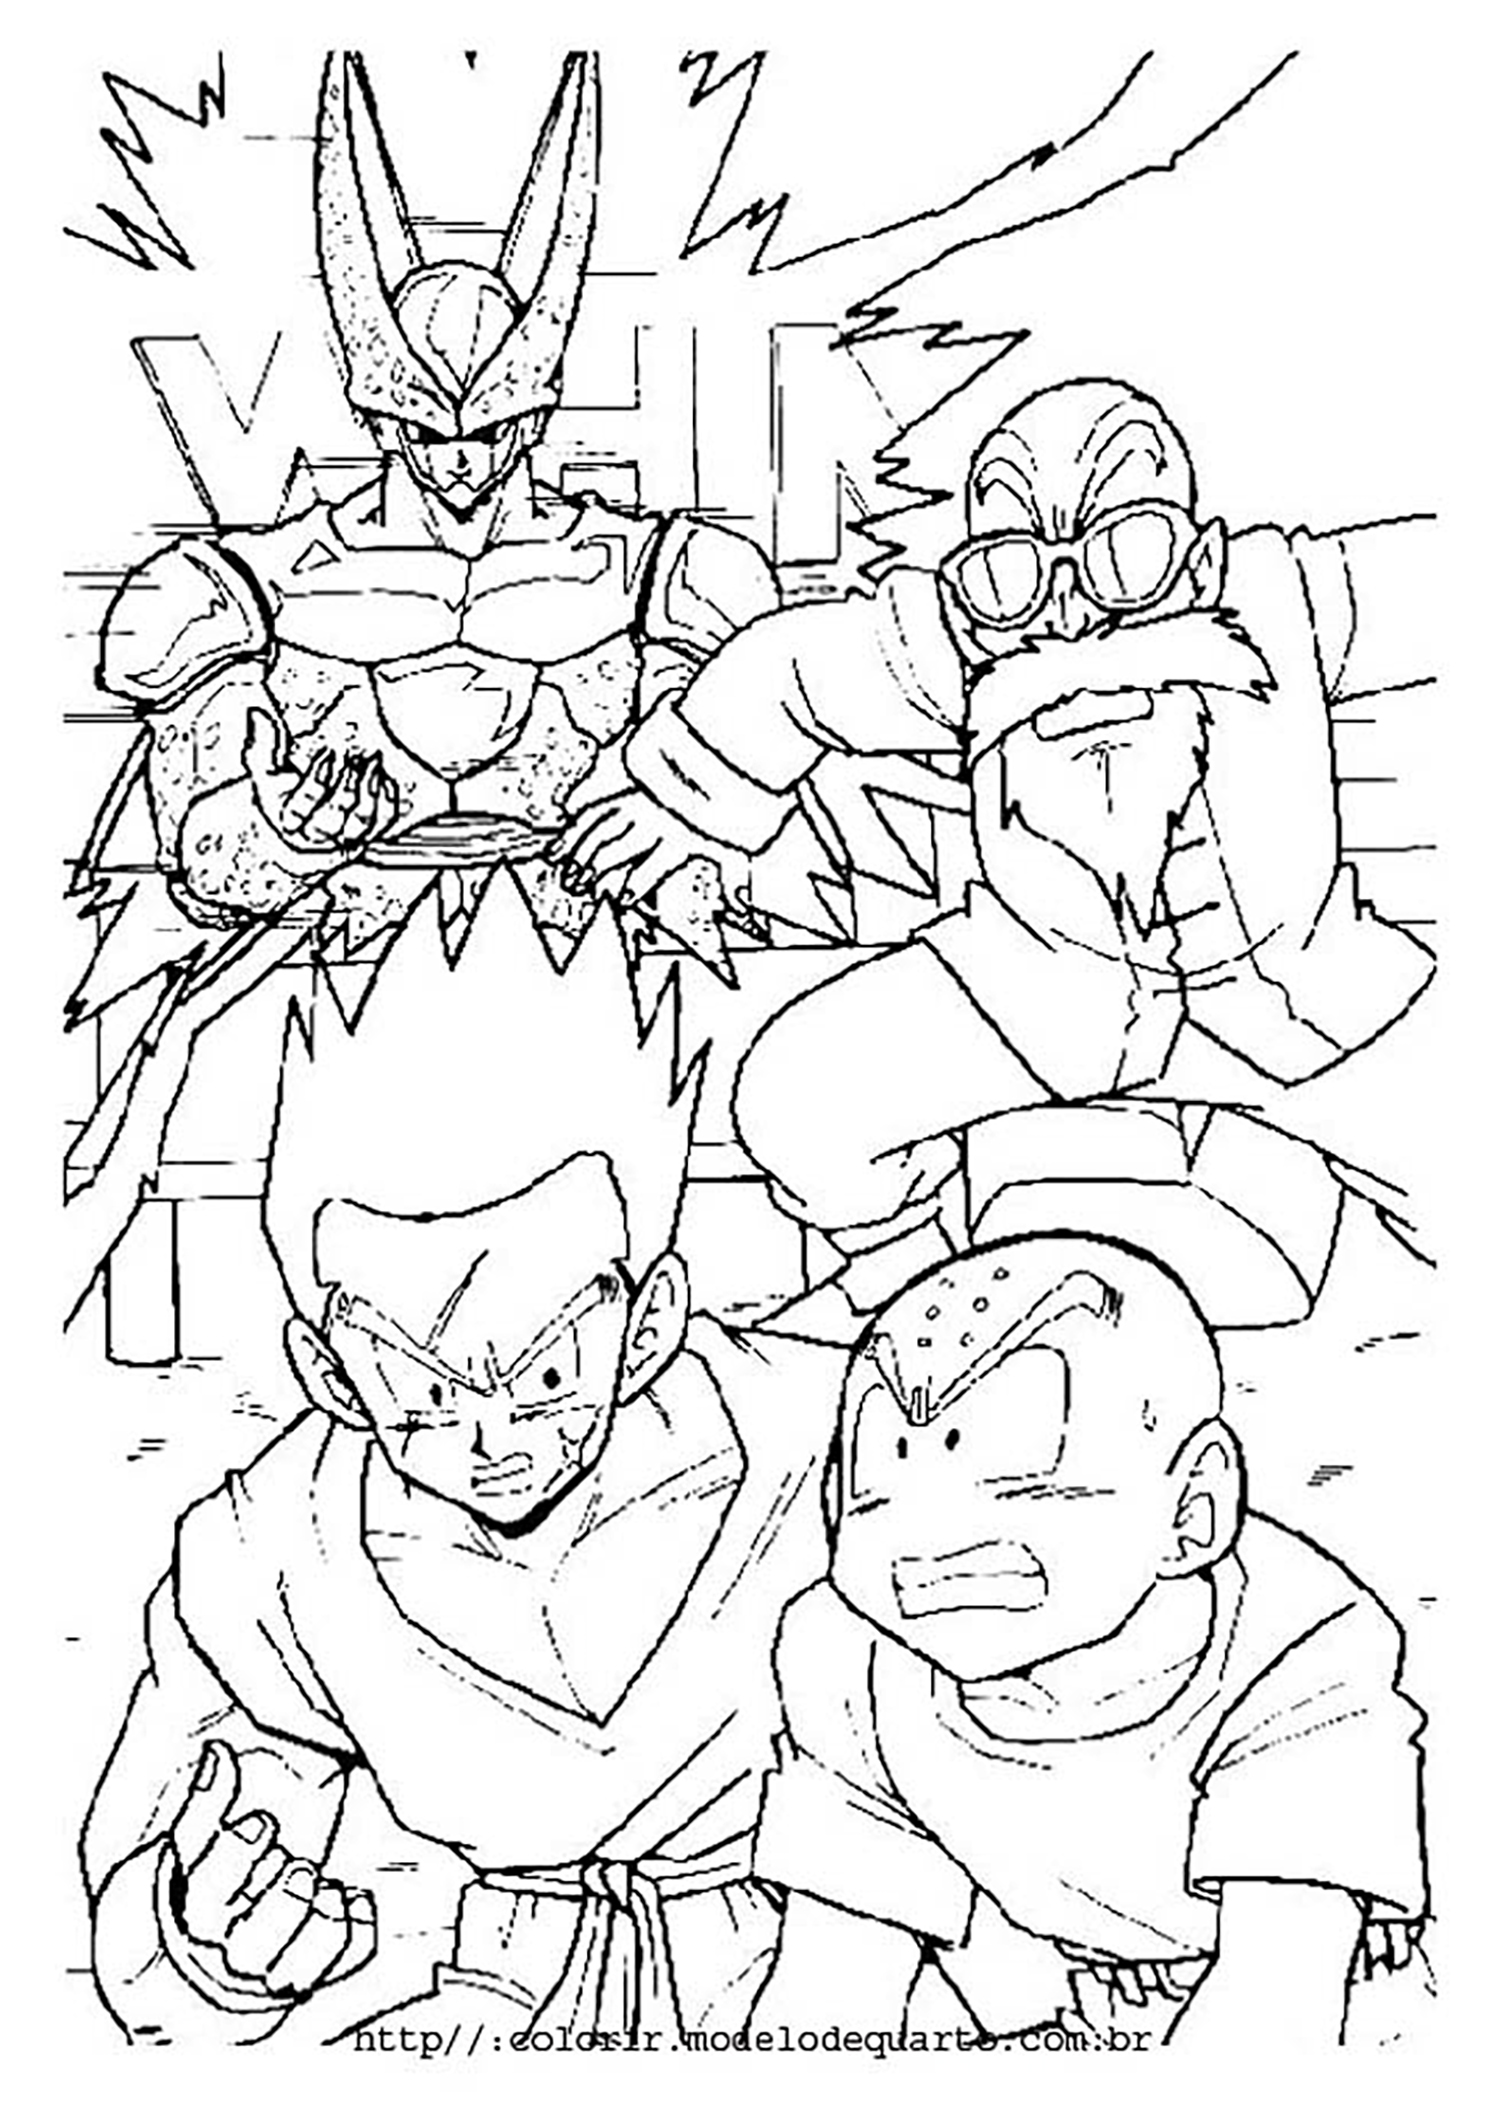 Beautiful Dragon Ball Z coloring page : Cell , Krilin , Kamé Senin and Yamcha